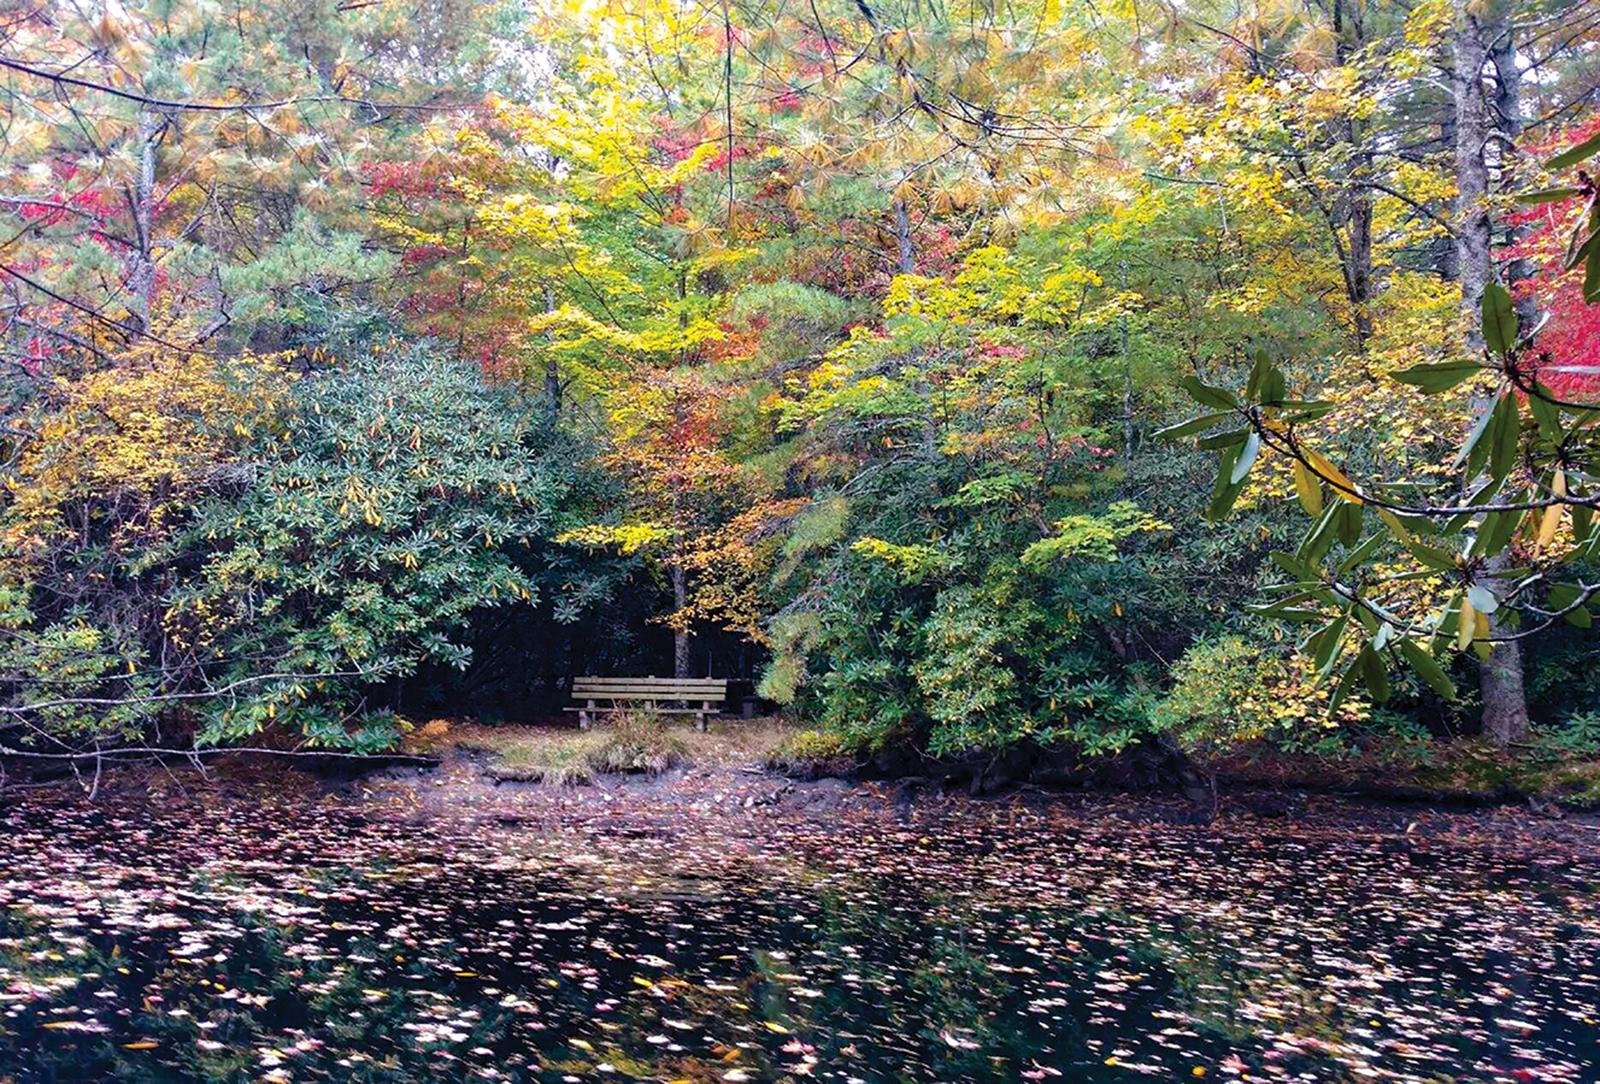 highlands cashiers land trust Bench at Dixon Pond